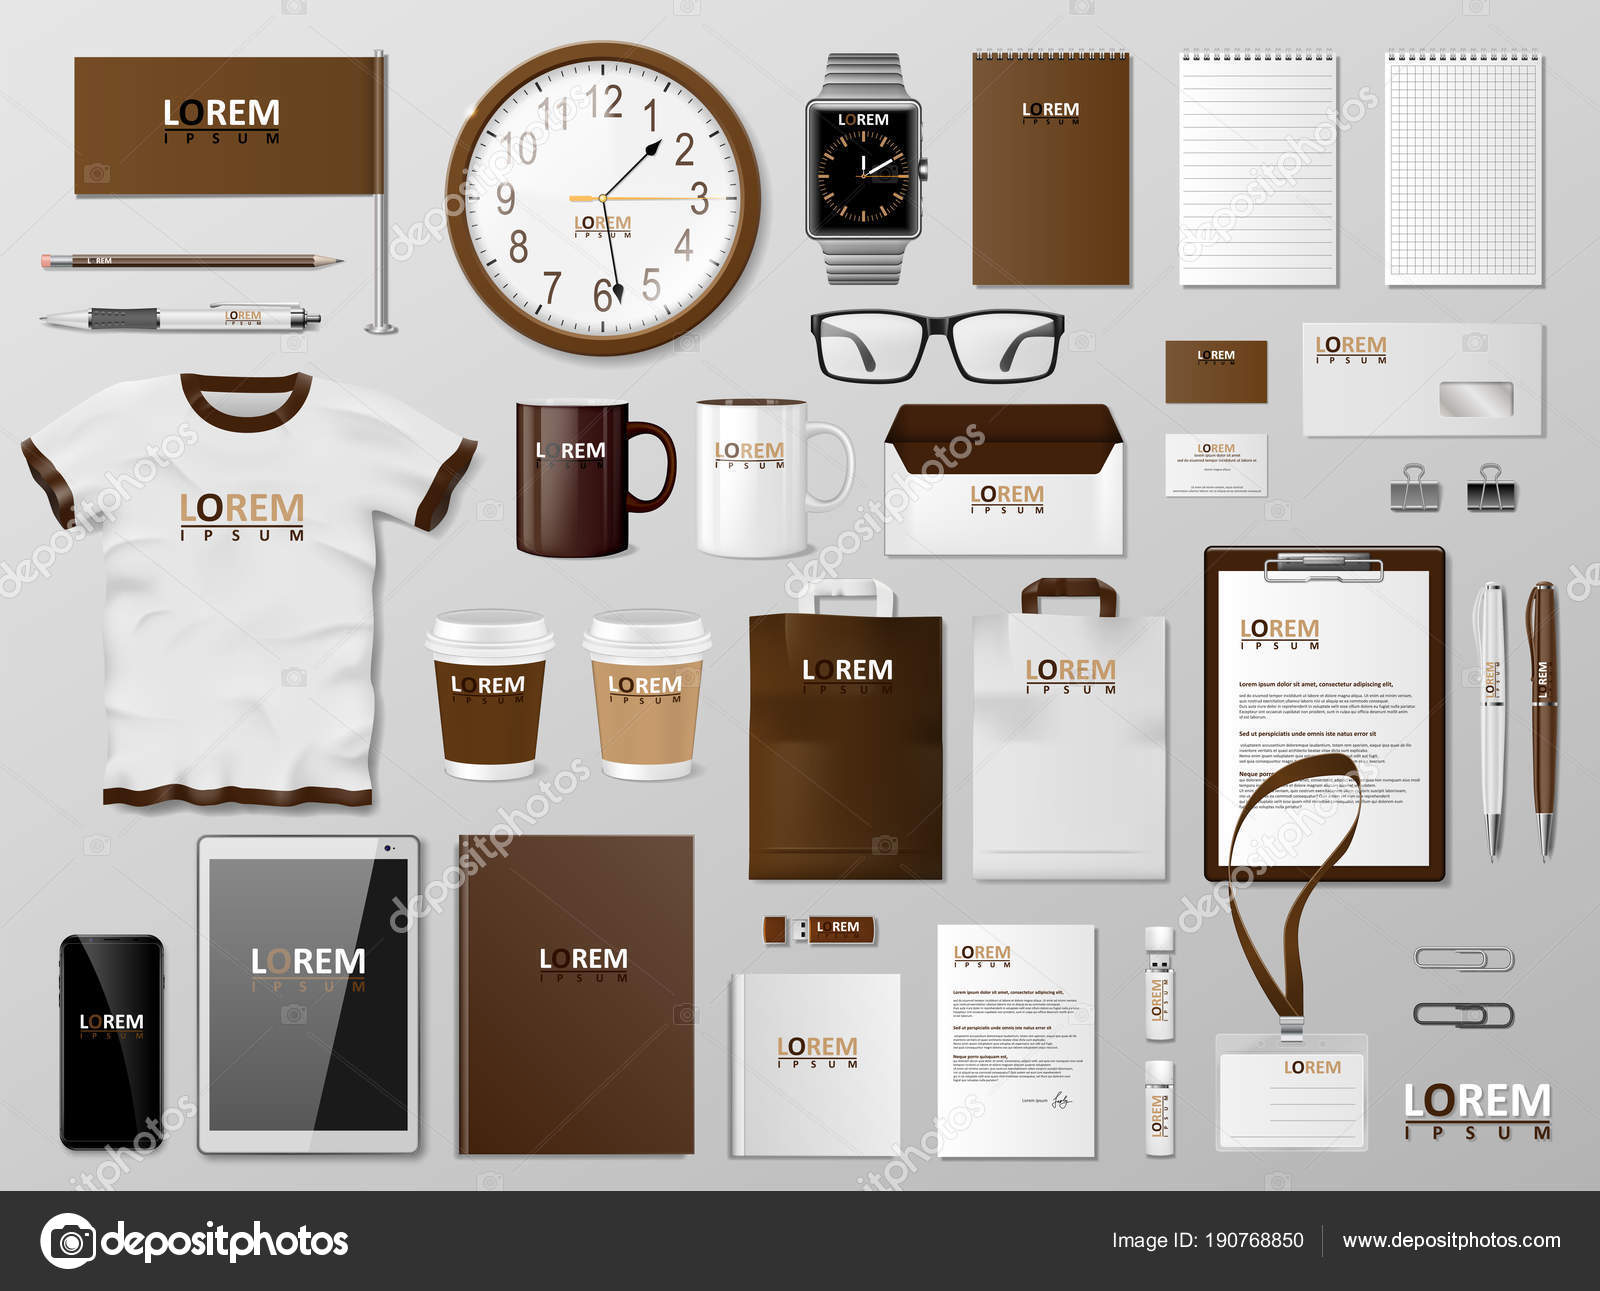 Branding Template | Corporate Branding Identity Template Brown Design Modern Realistic